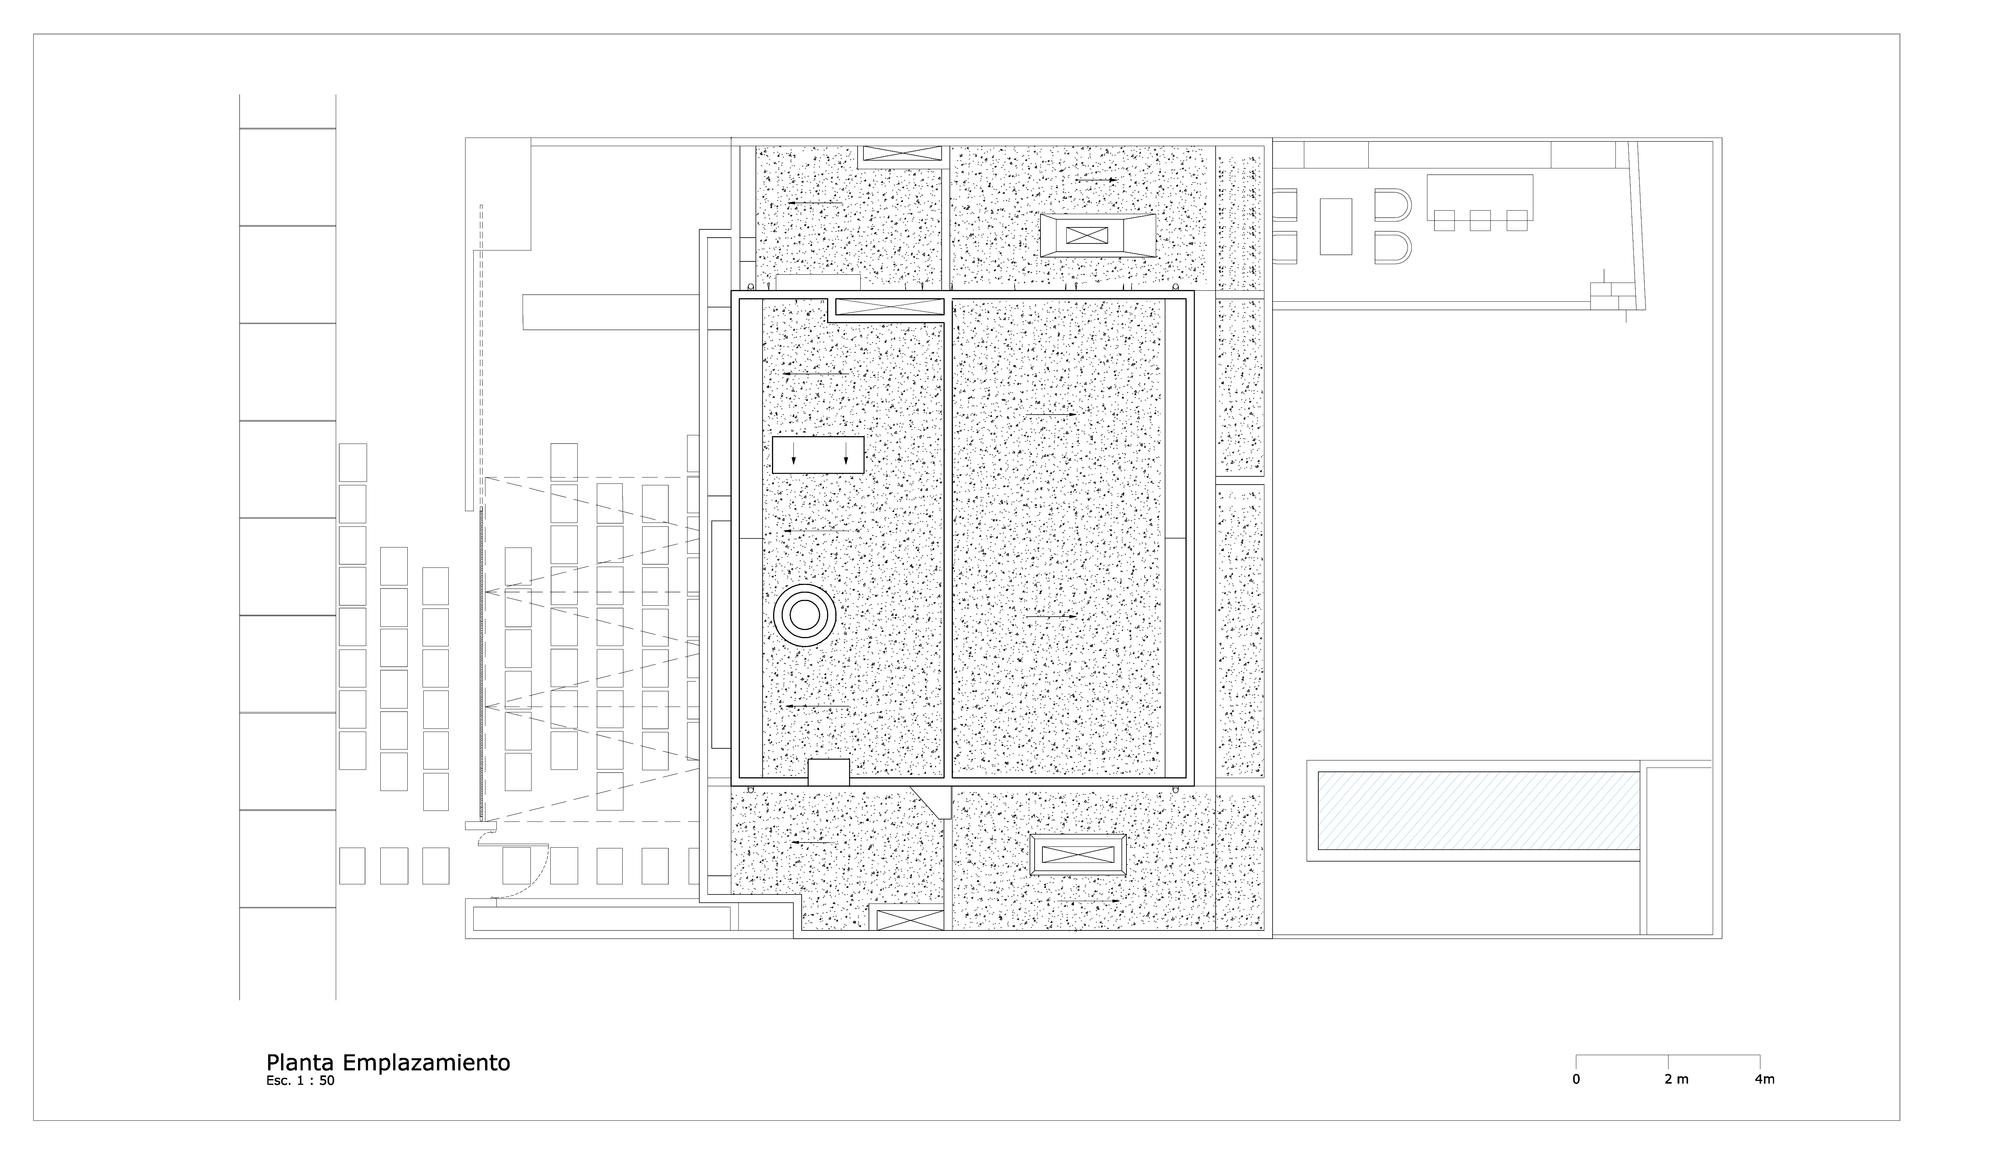 Galer a de casa m laga prietoschaffer arquitectos 11 - Arquitectos interioristas malaga ...